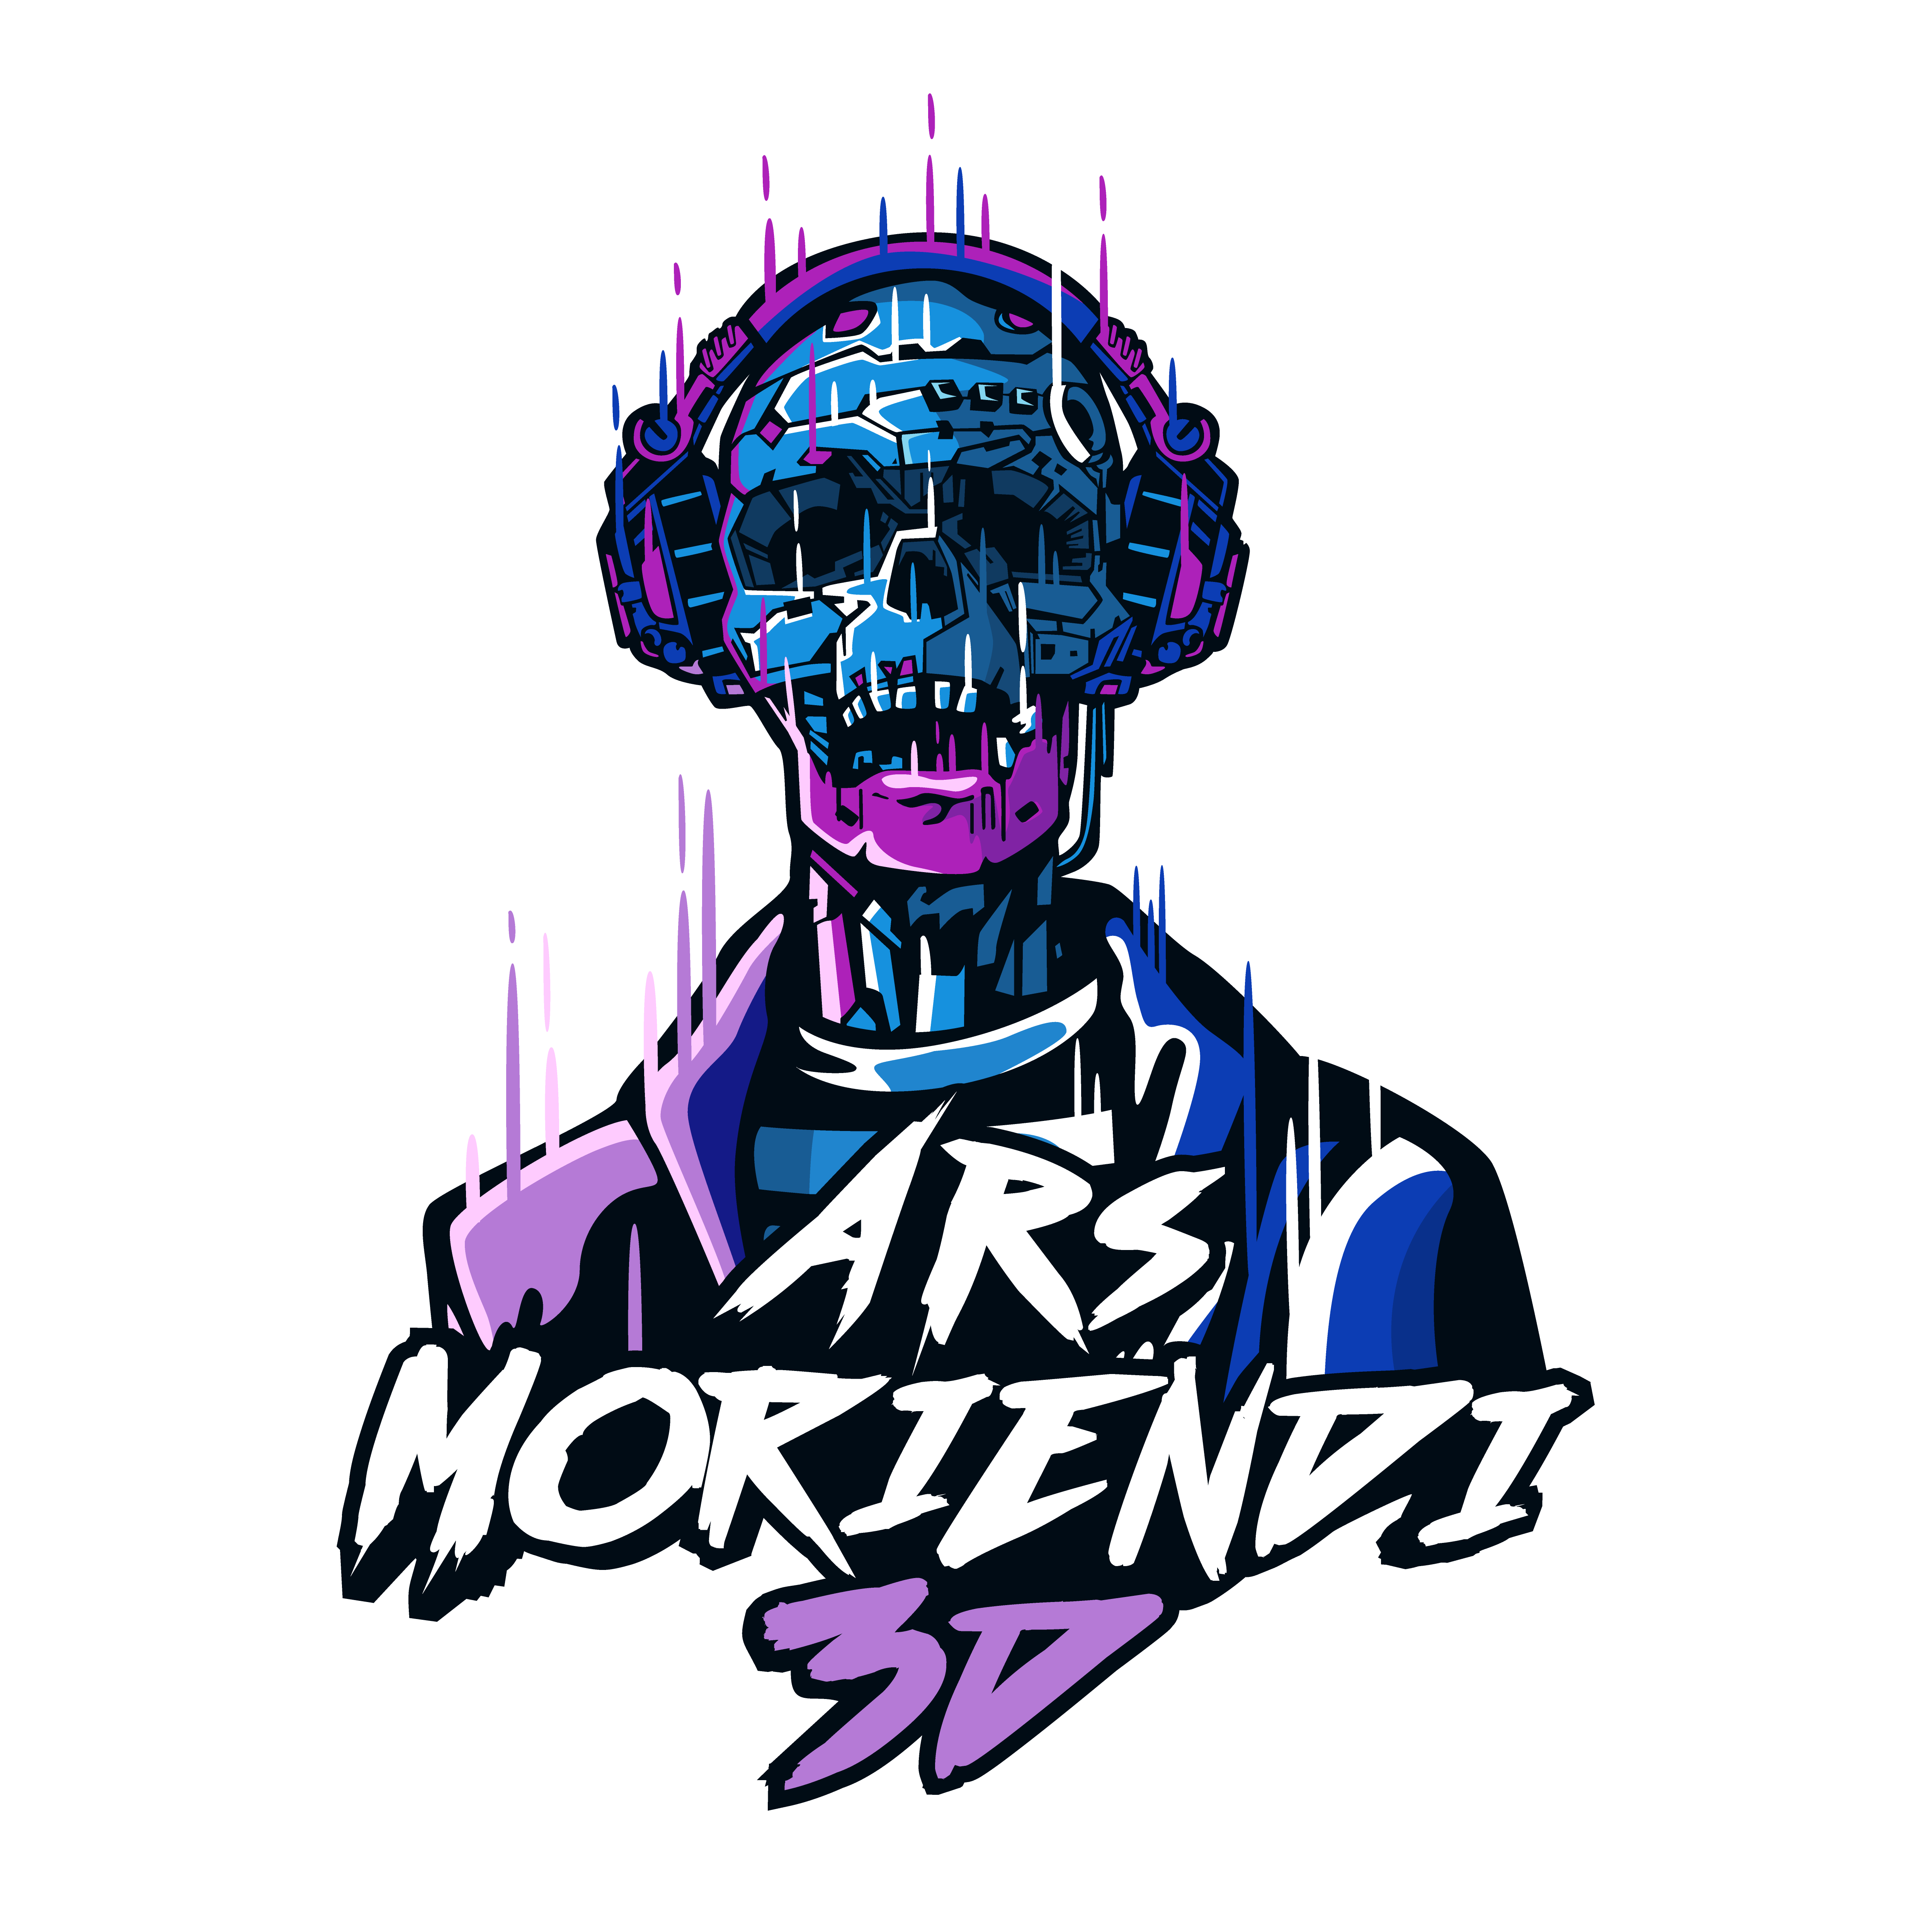 Ars Moriendi 3D